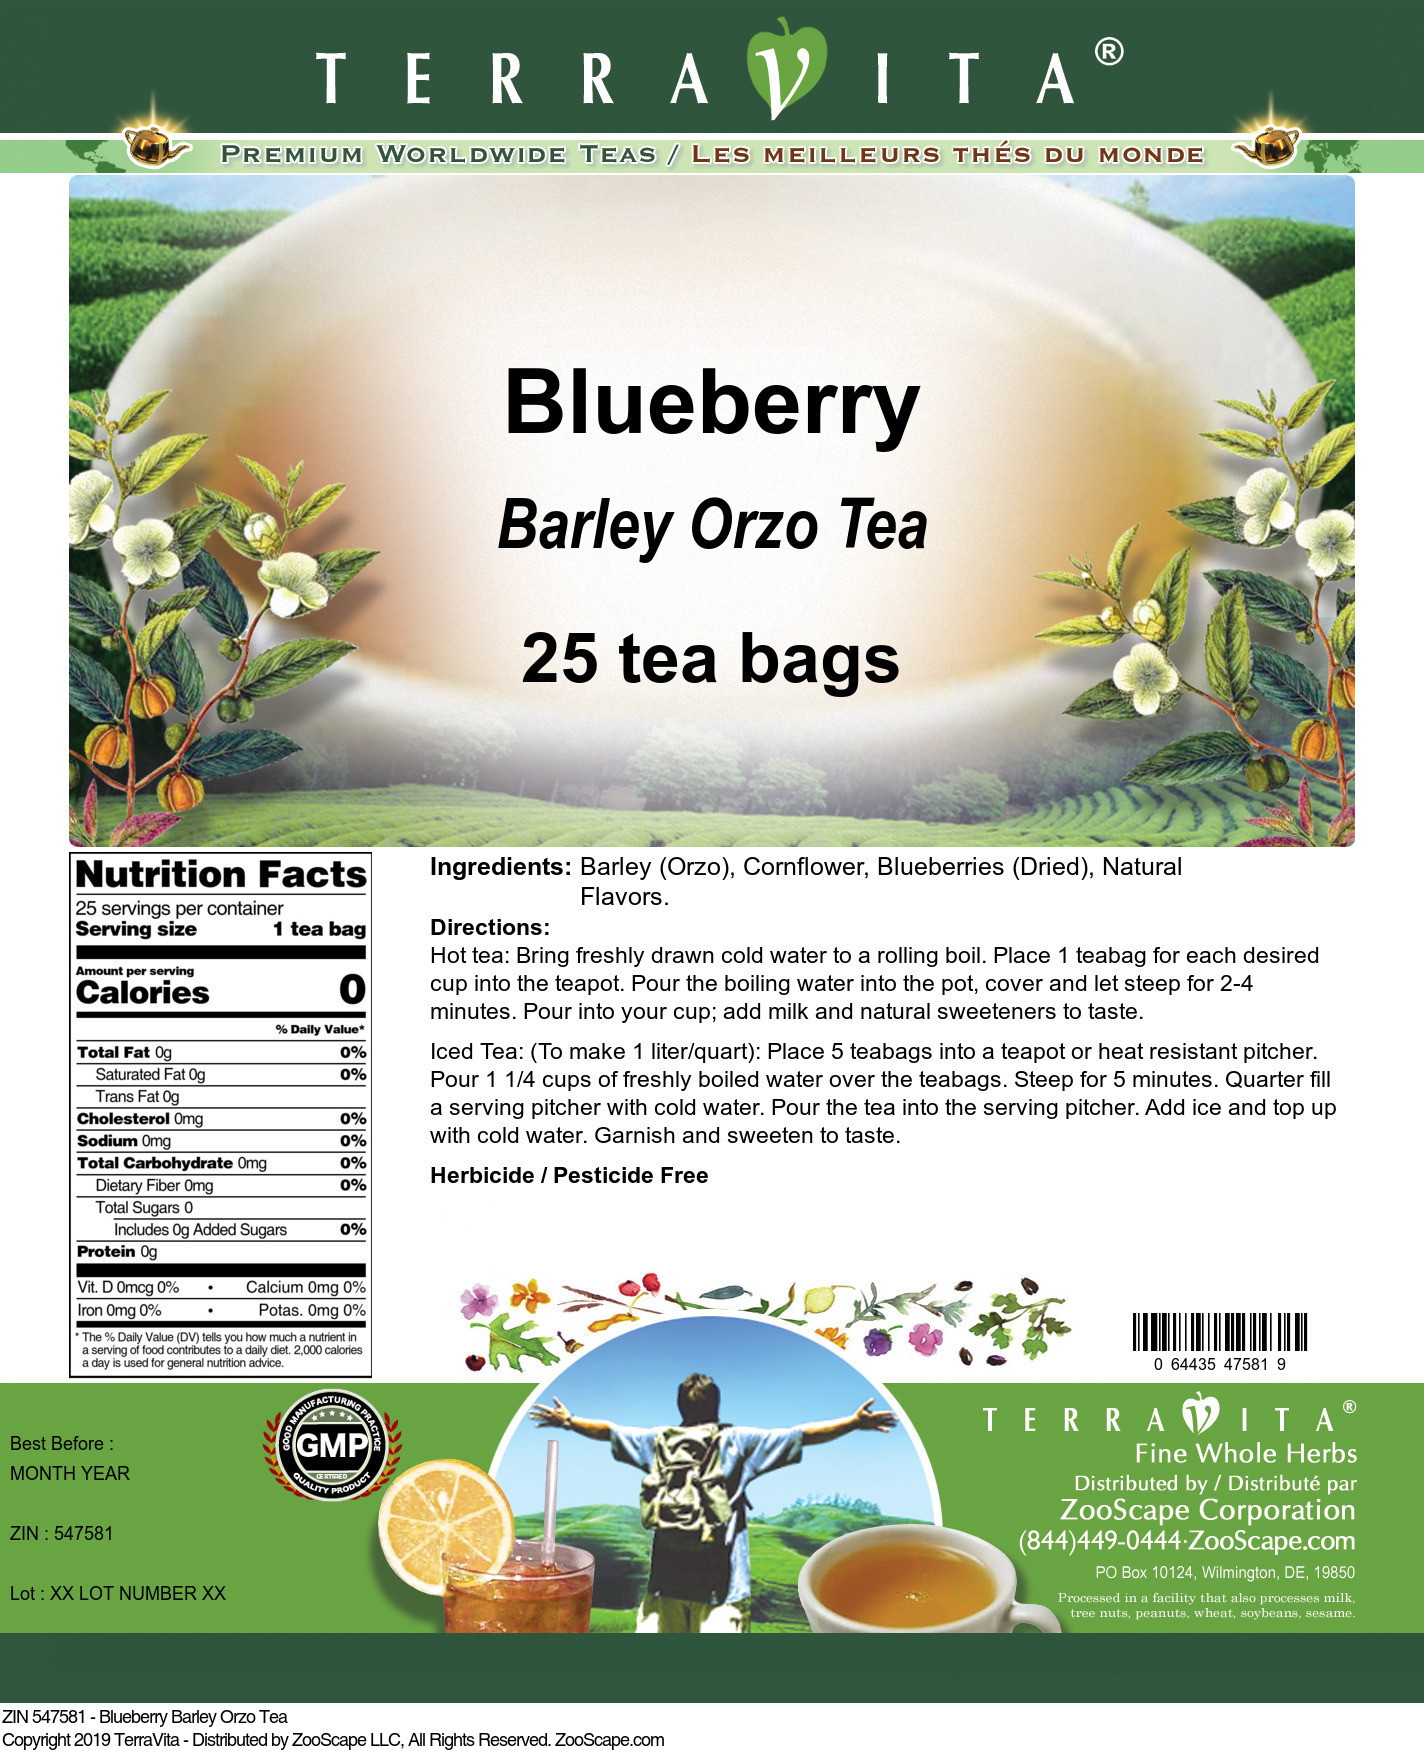 Blueberry Barley Orzo Tea